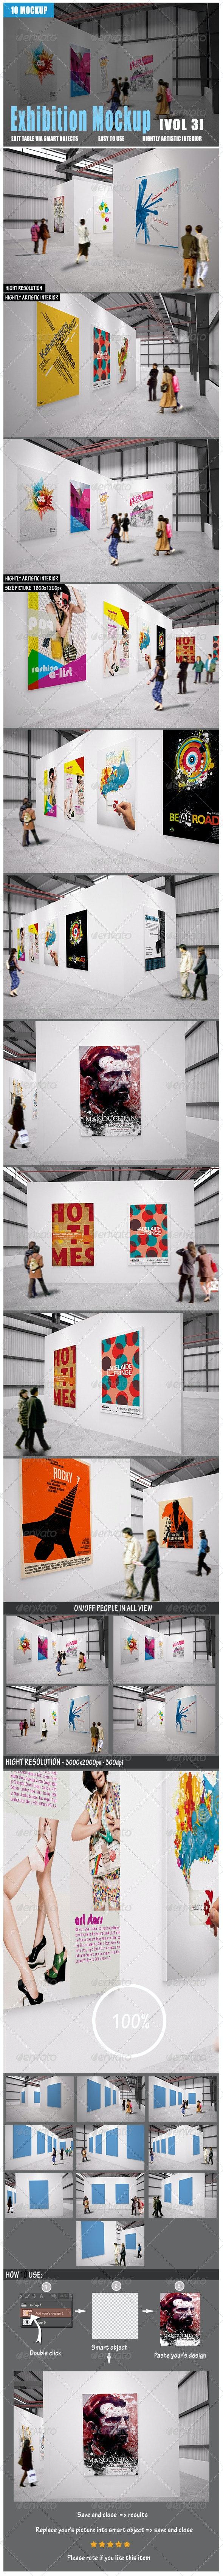 Exhibition Mockup [vol3] - Posters Print